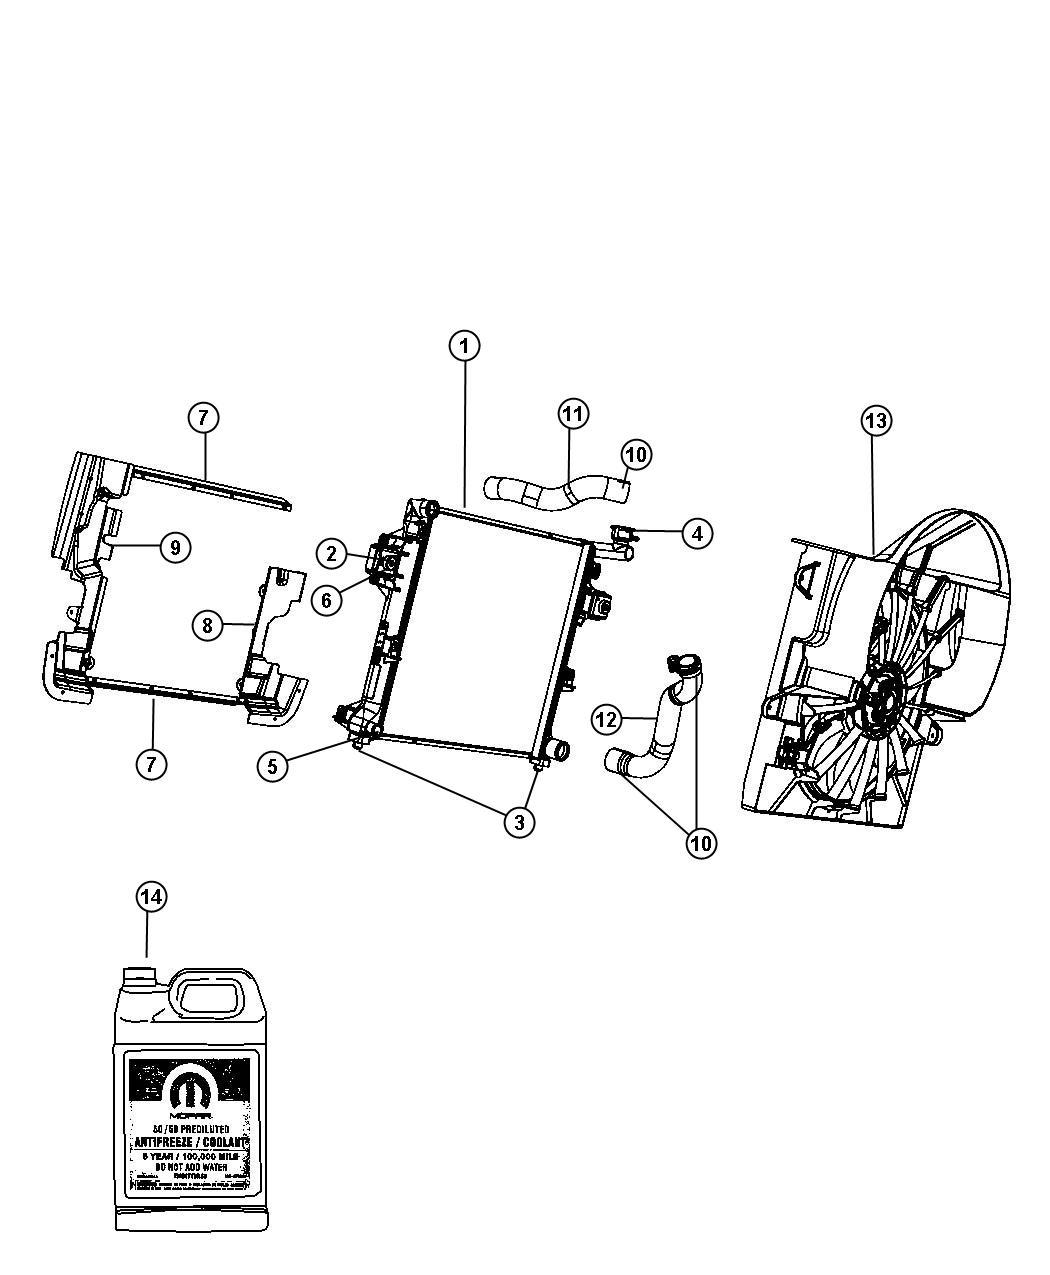 Jeep Liberty Antifreeze Coolant Gallon Red Coolant